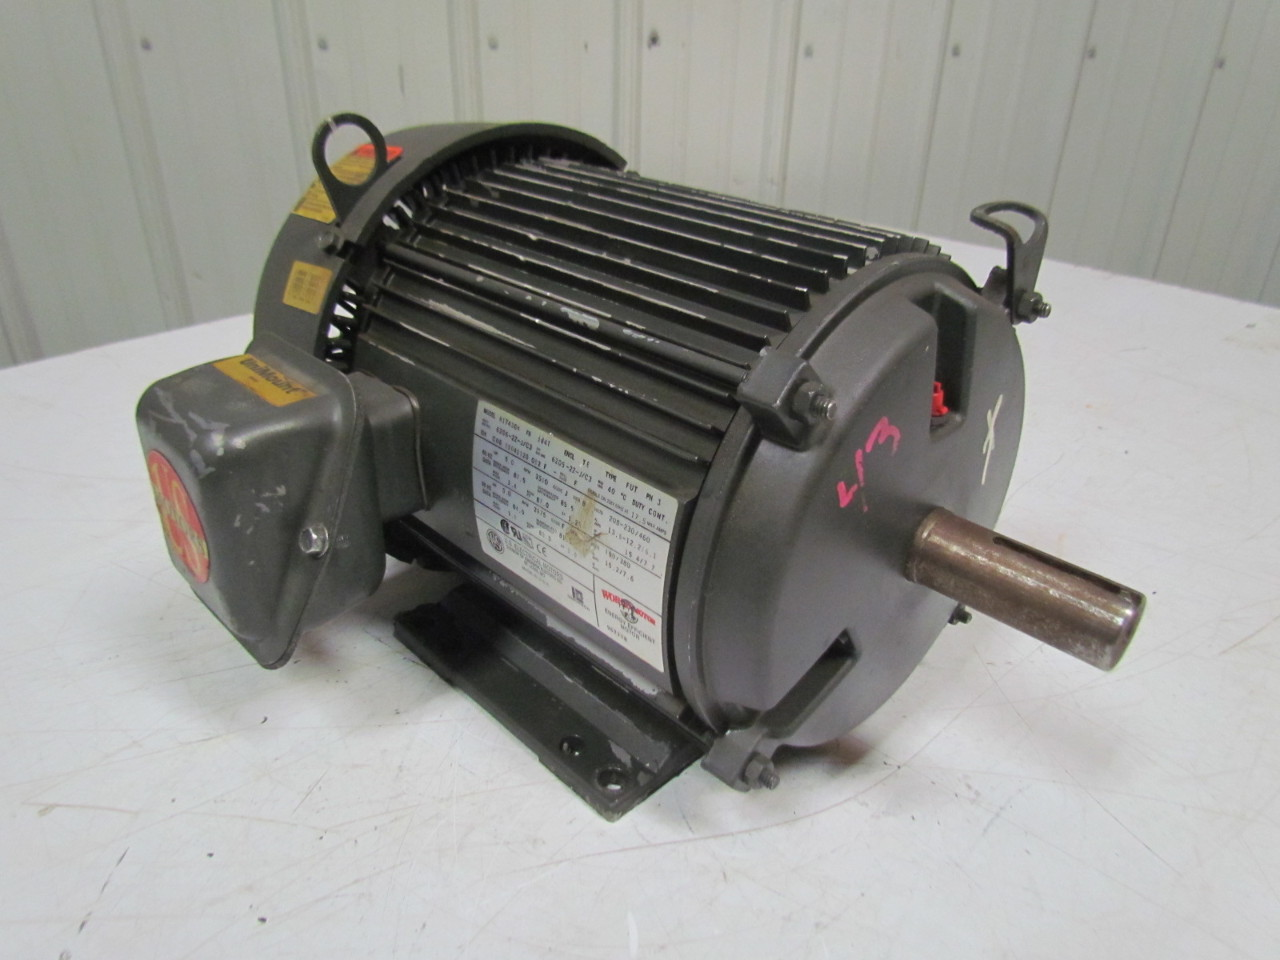 U s motors h17430a 5hp electric motor 208 230 460v 3ph for 5hp 3ph electric motor